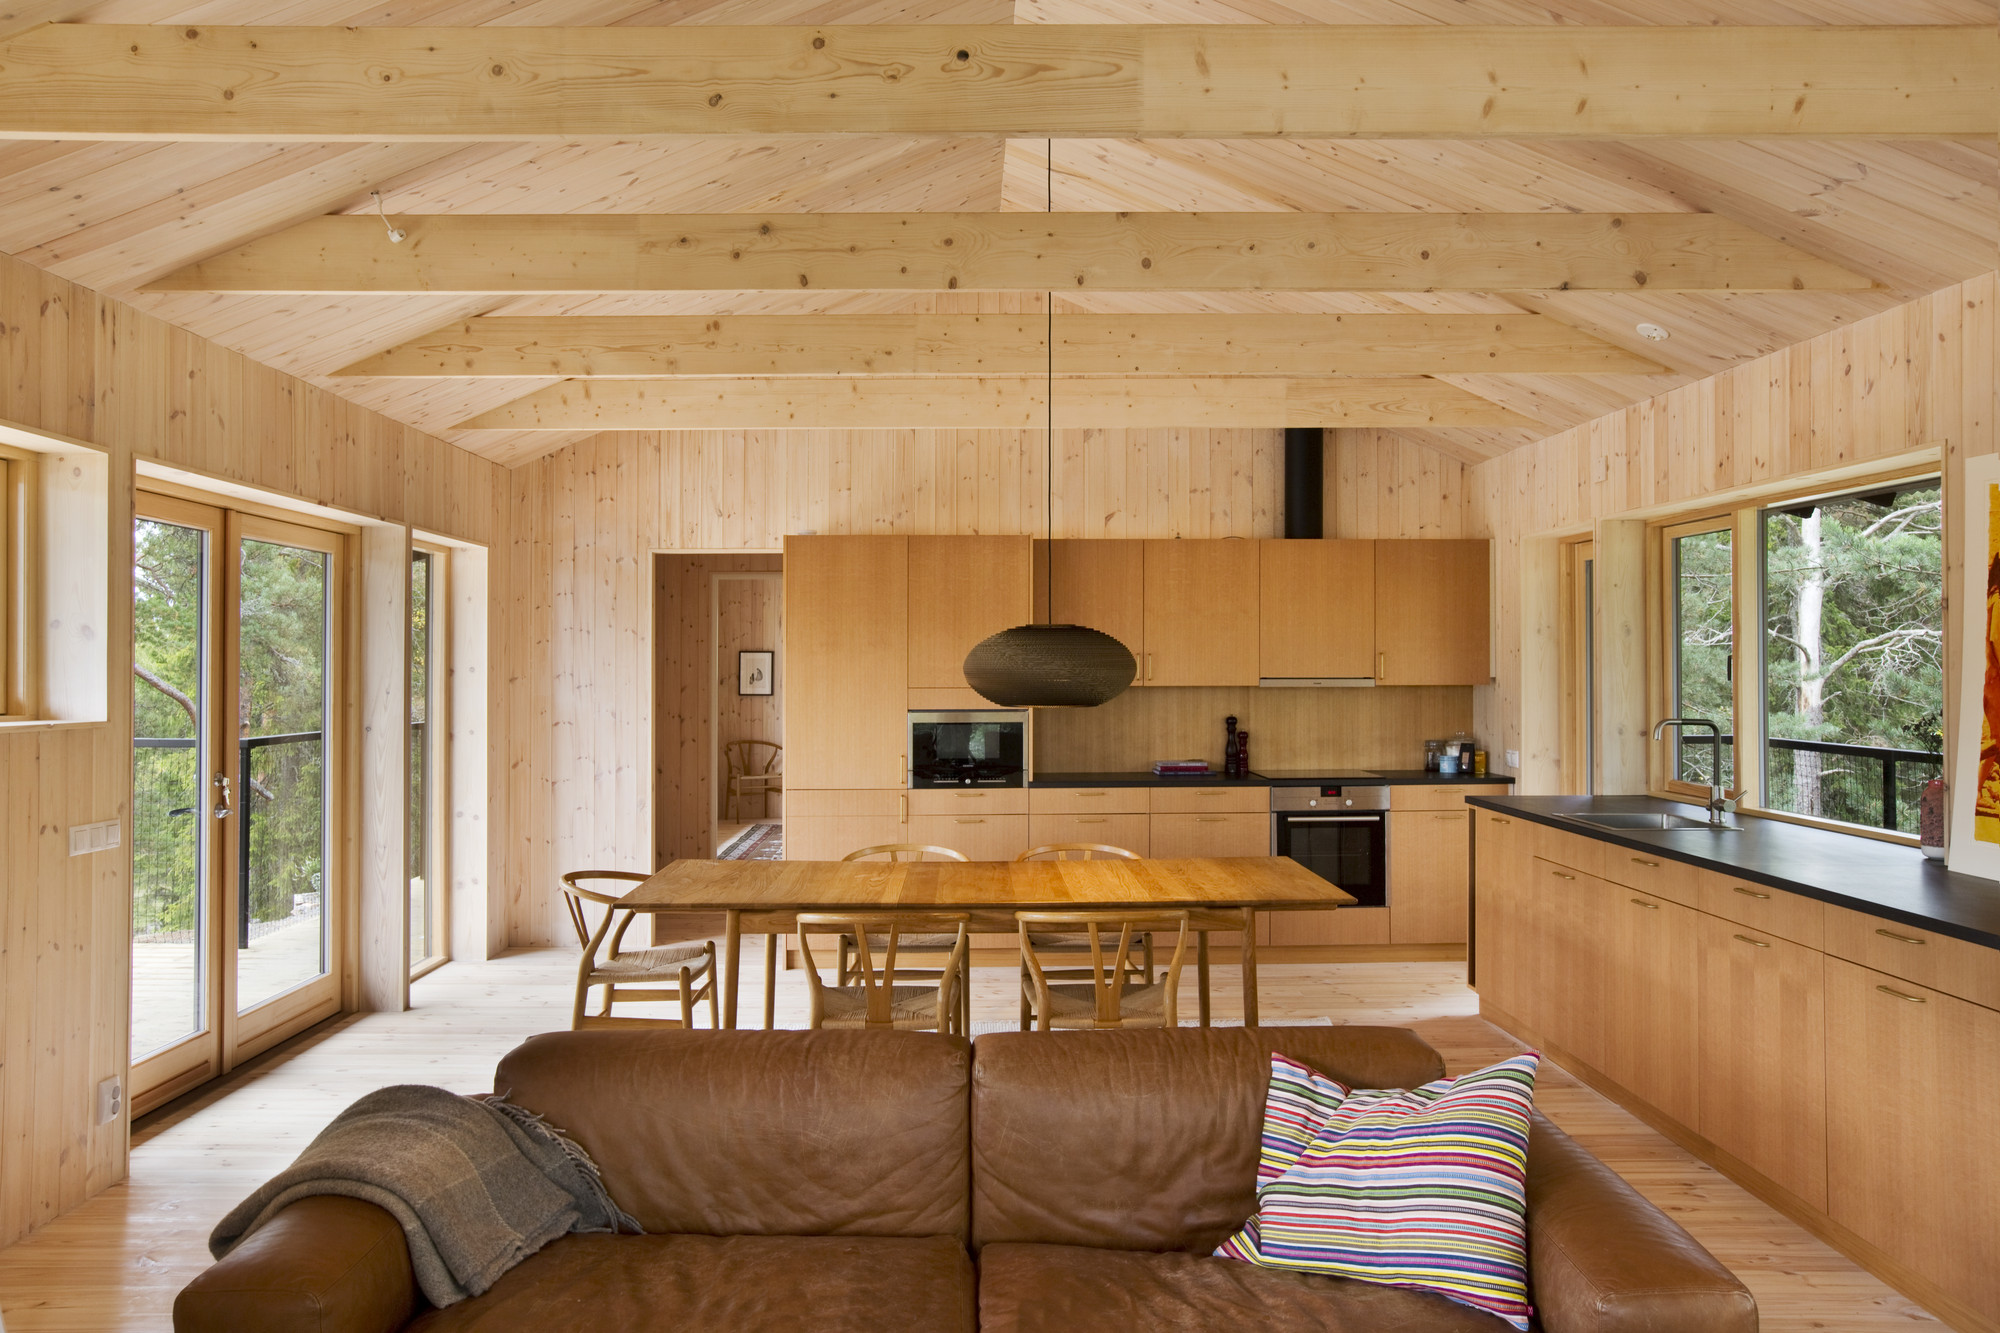 Galeria de casa de veraneio vind max holst 9 for Interior de la casa de madera moderna